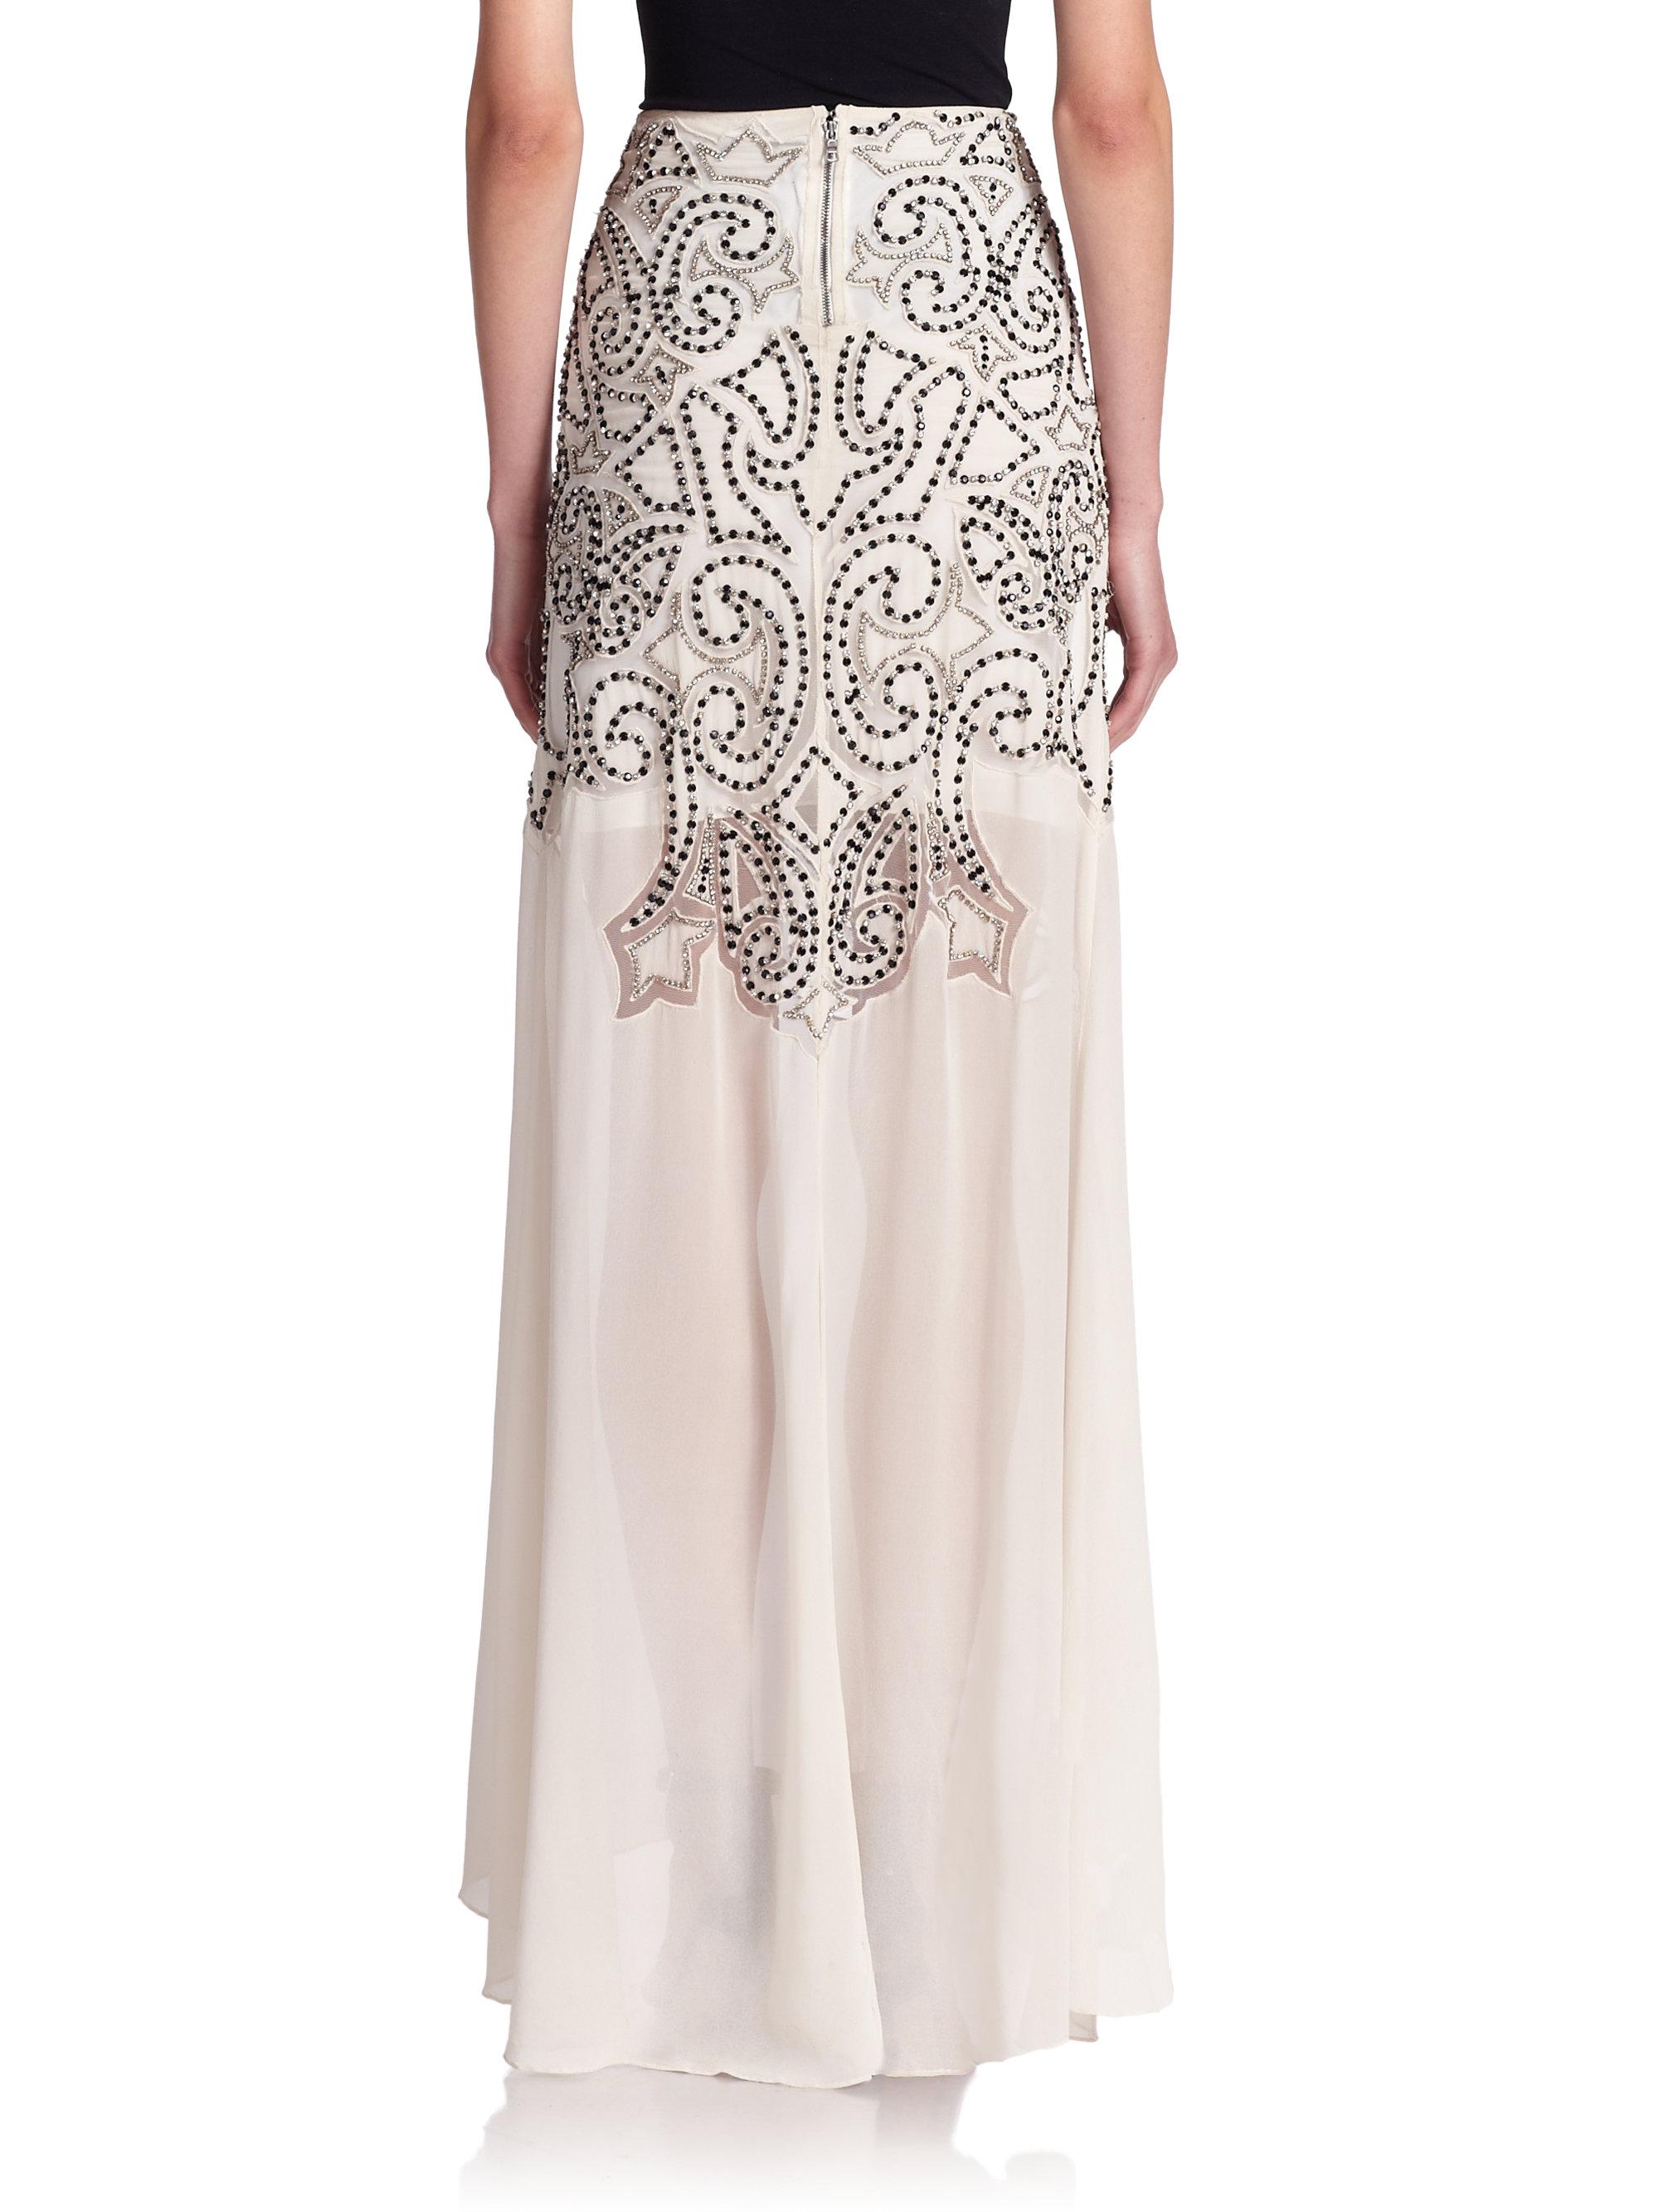 3855763c33 Alice + Olivia Rizo Beaded Maxi Skirt in White - Lyst